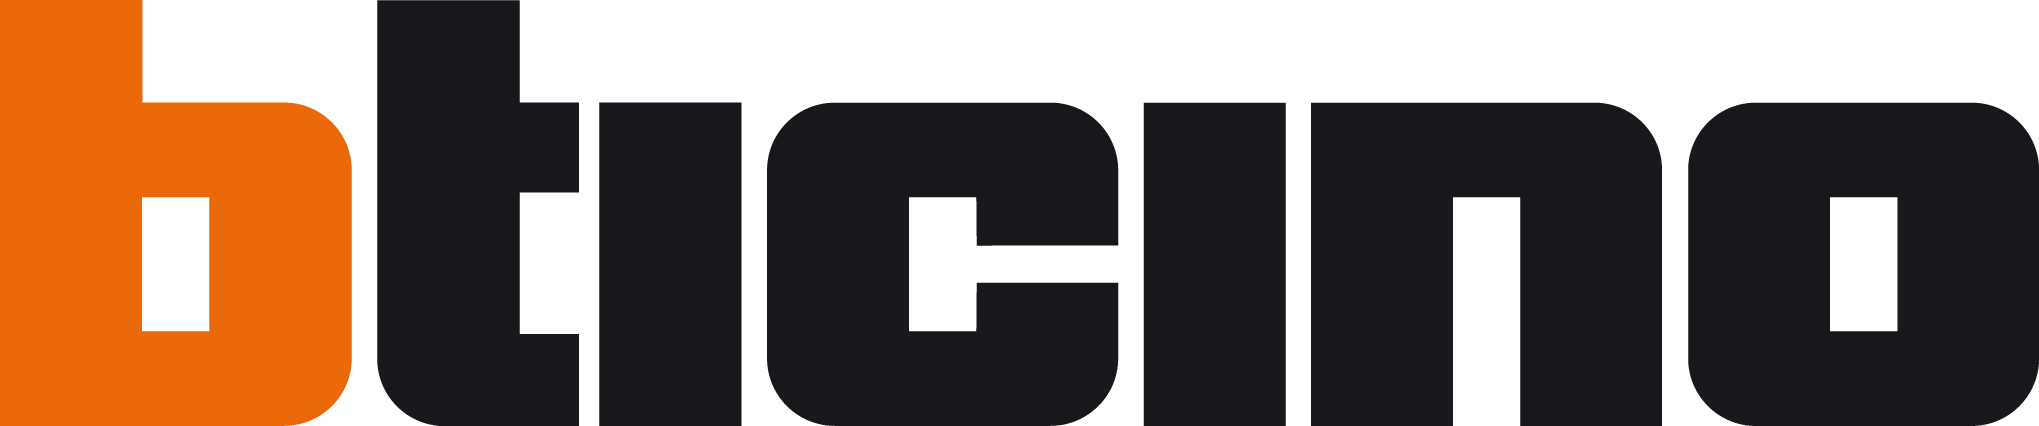 26 avril 2014 By Julien CARUSO Logos HD Avril